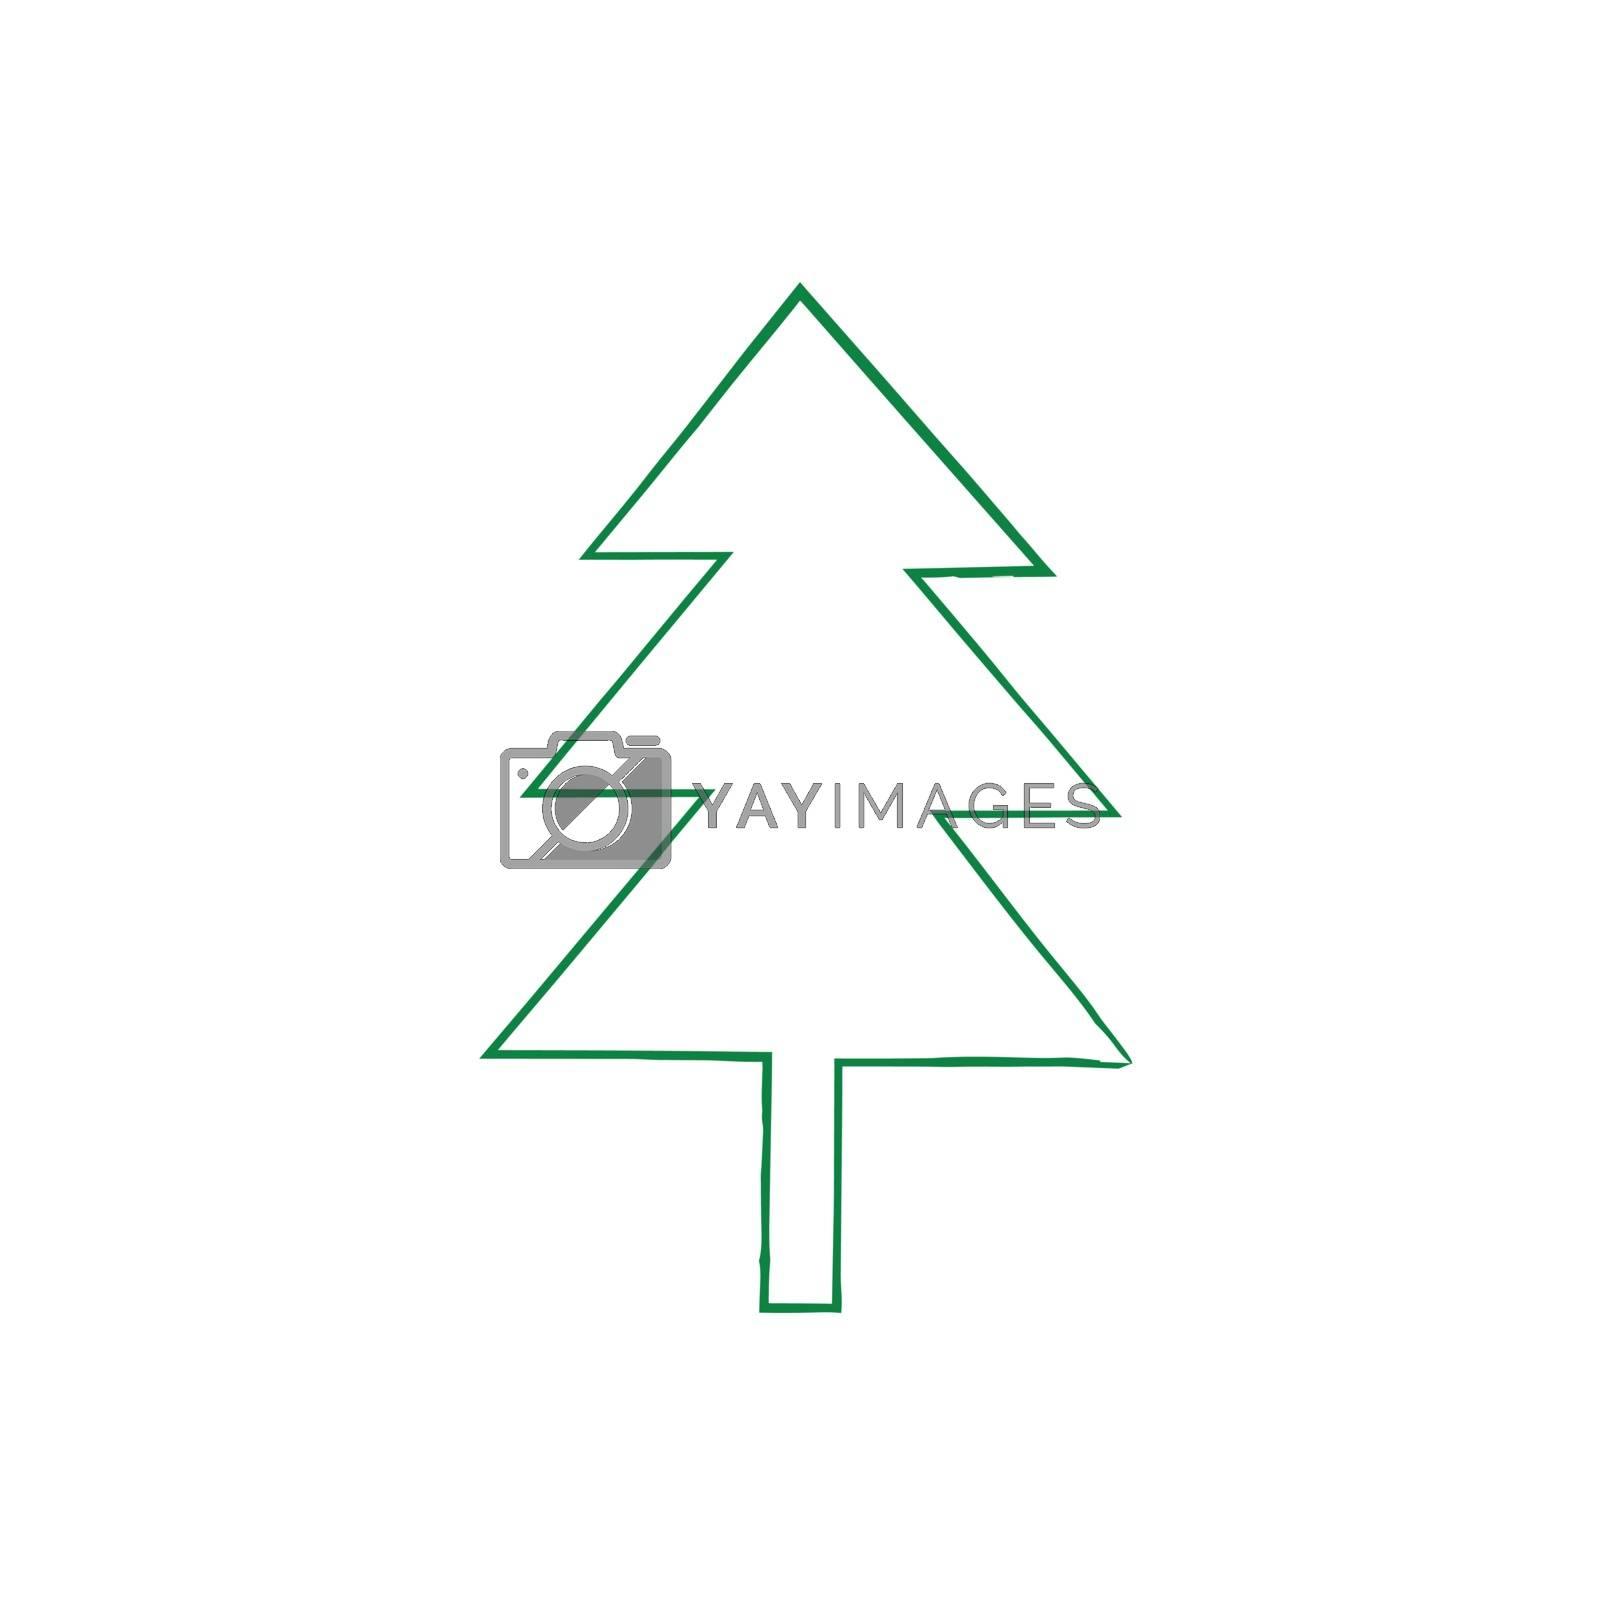 Royalty free image of Christmas tree grunge silhouette by olegkozyrev